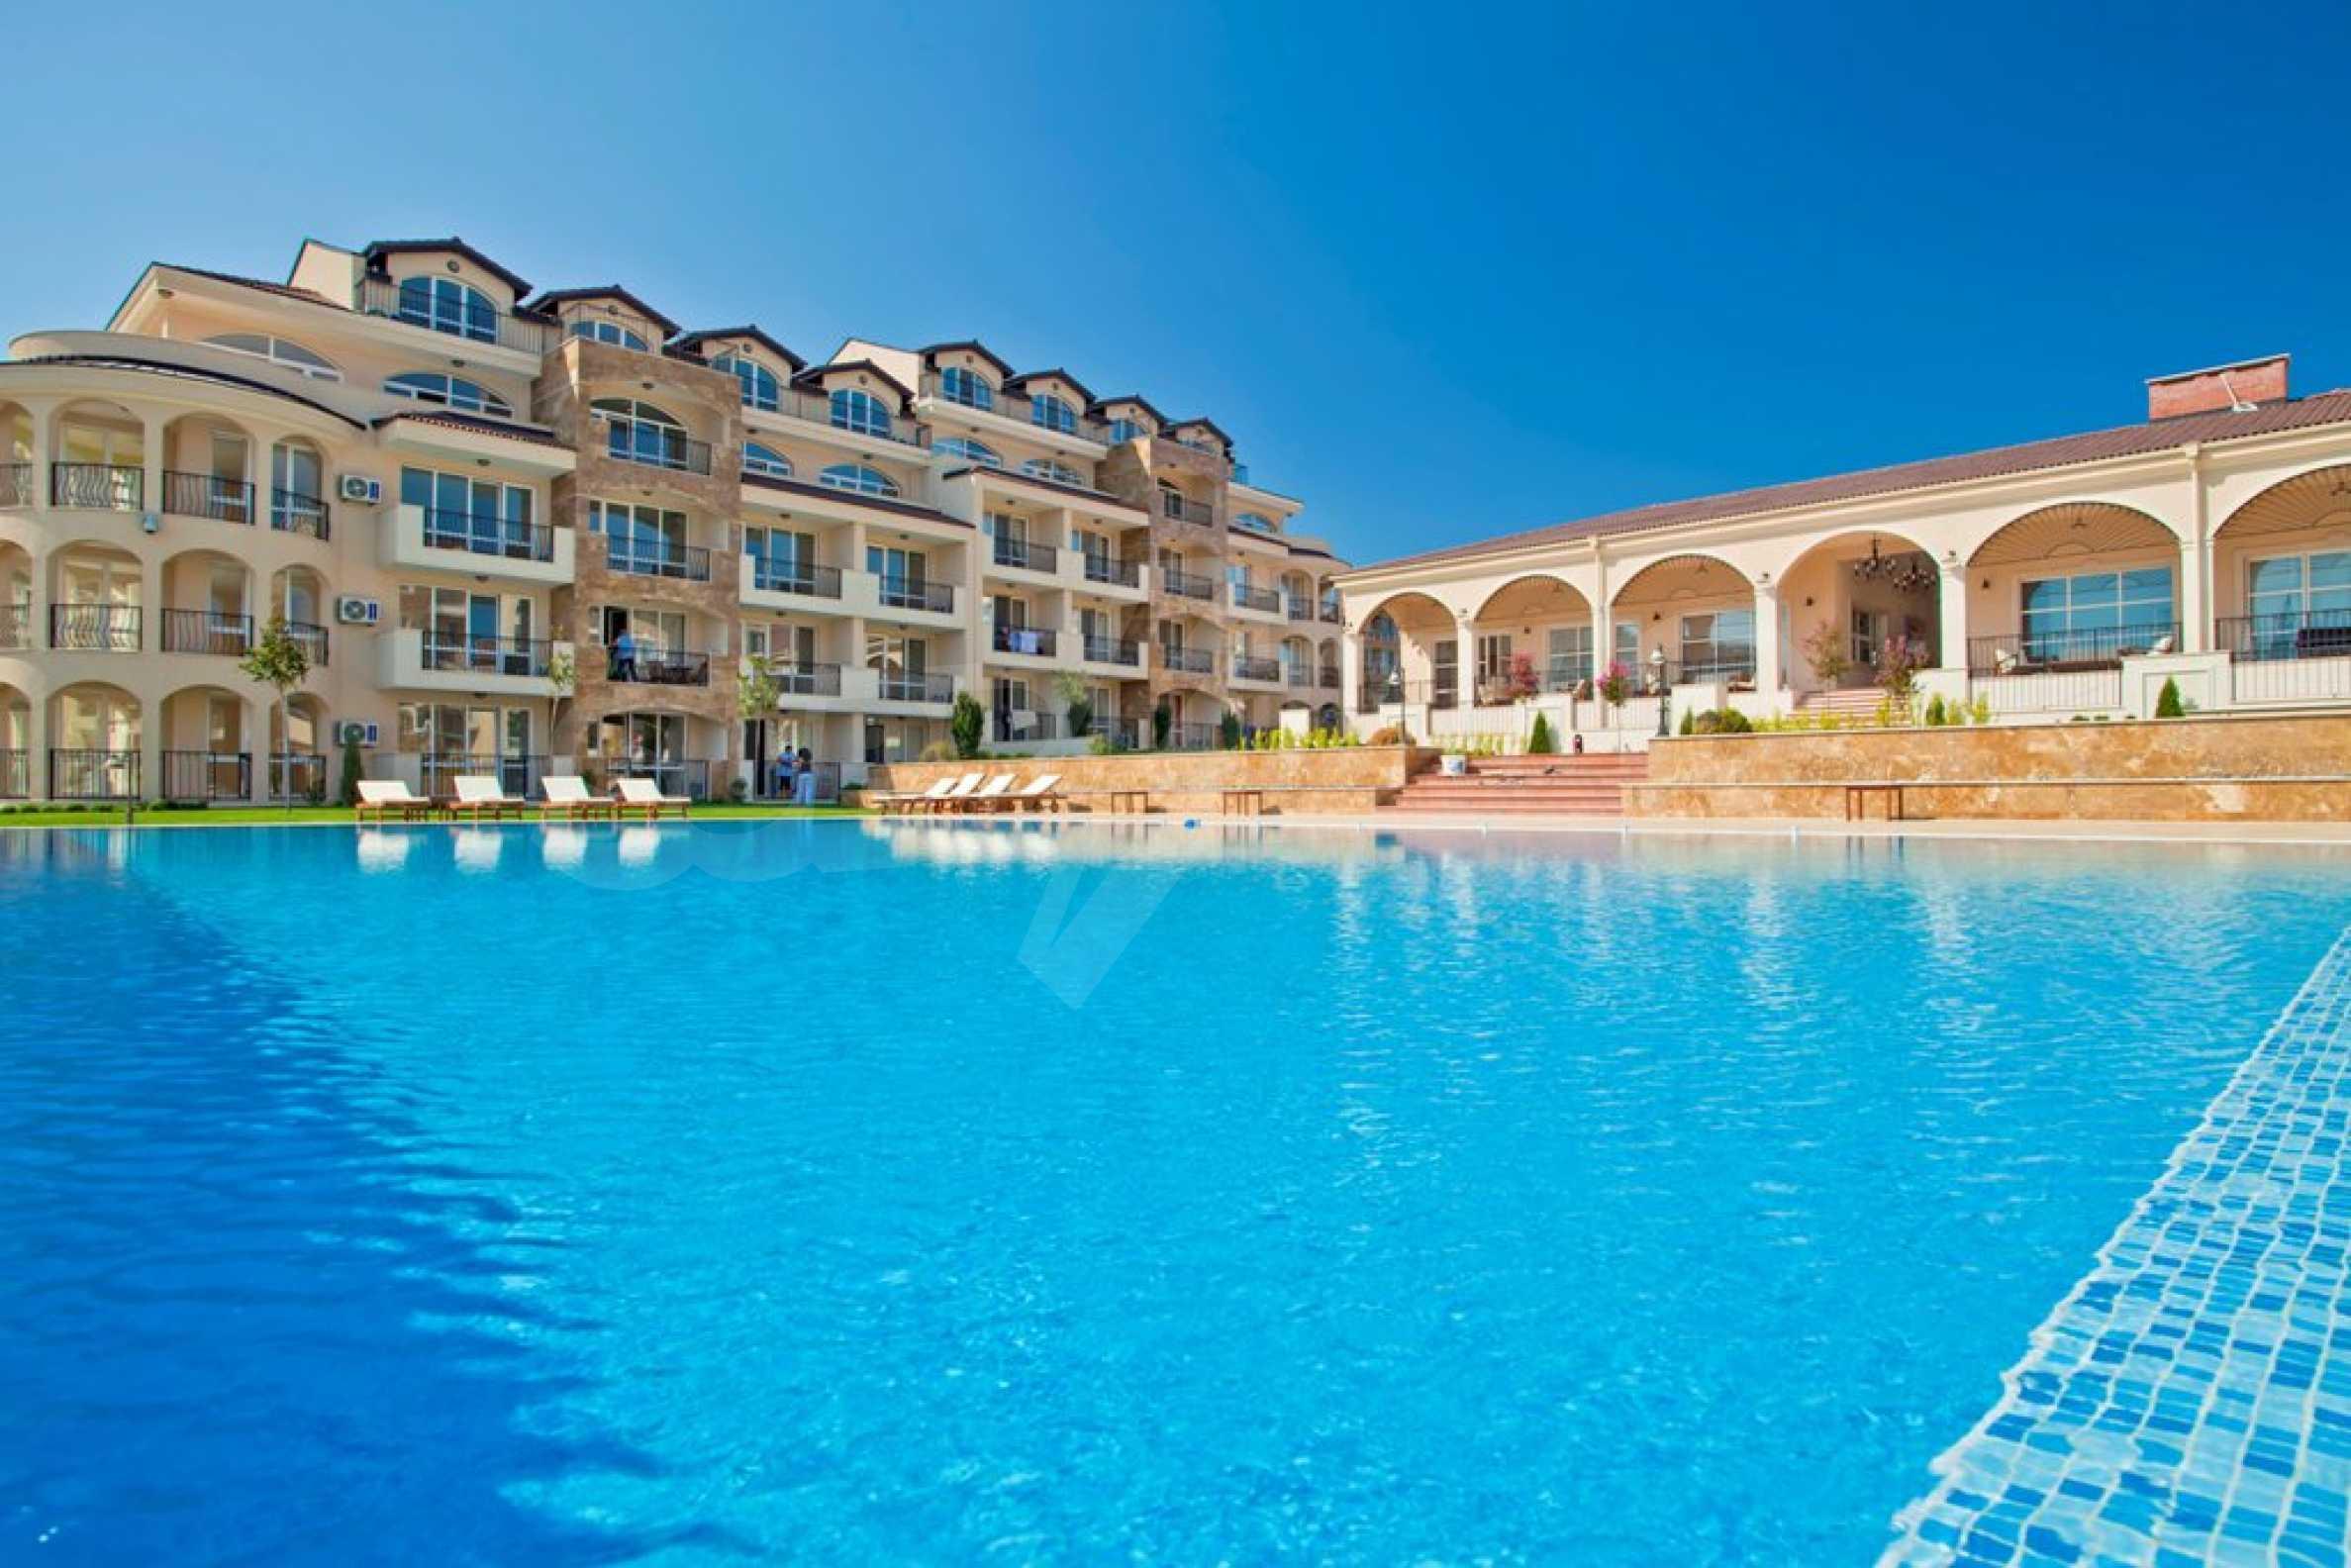 New apartment complex Atia resort in Chernomorets 2